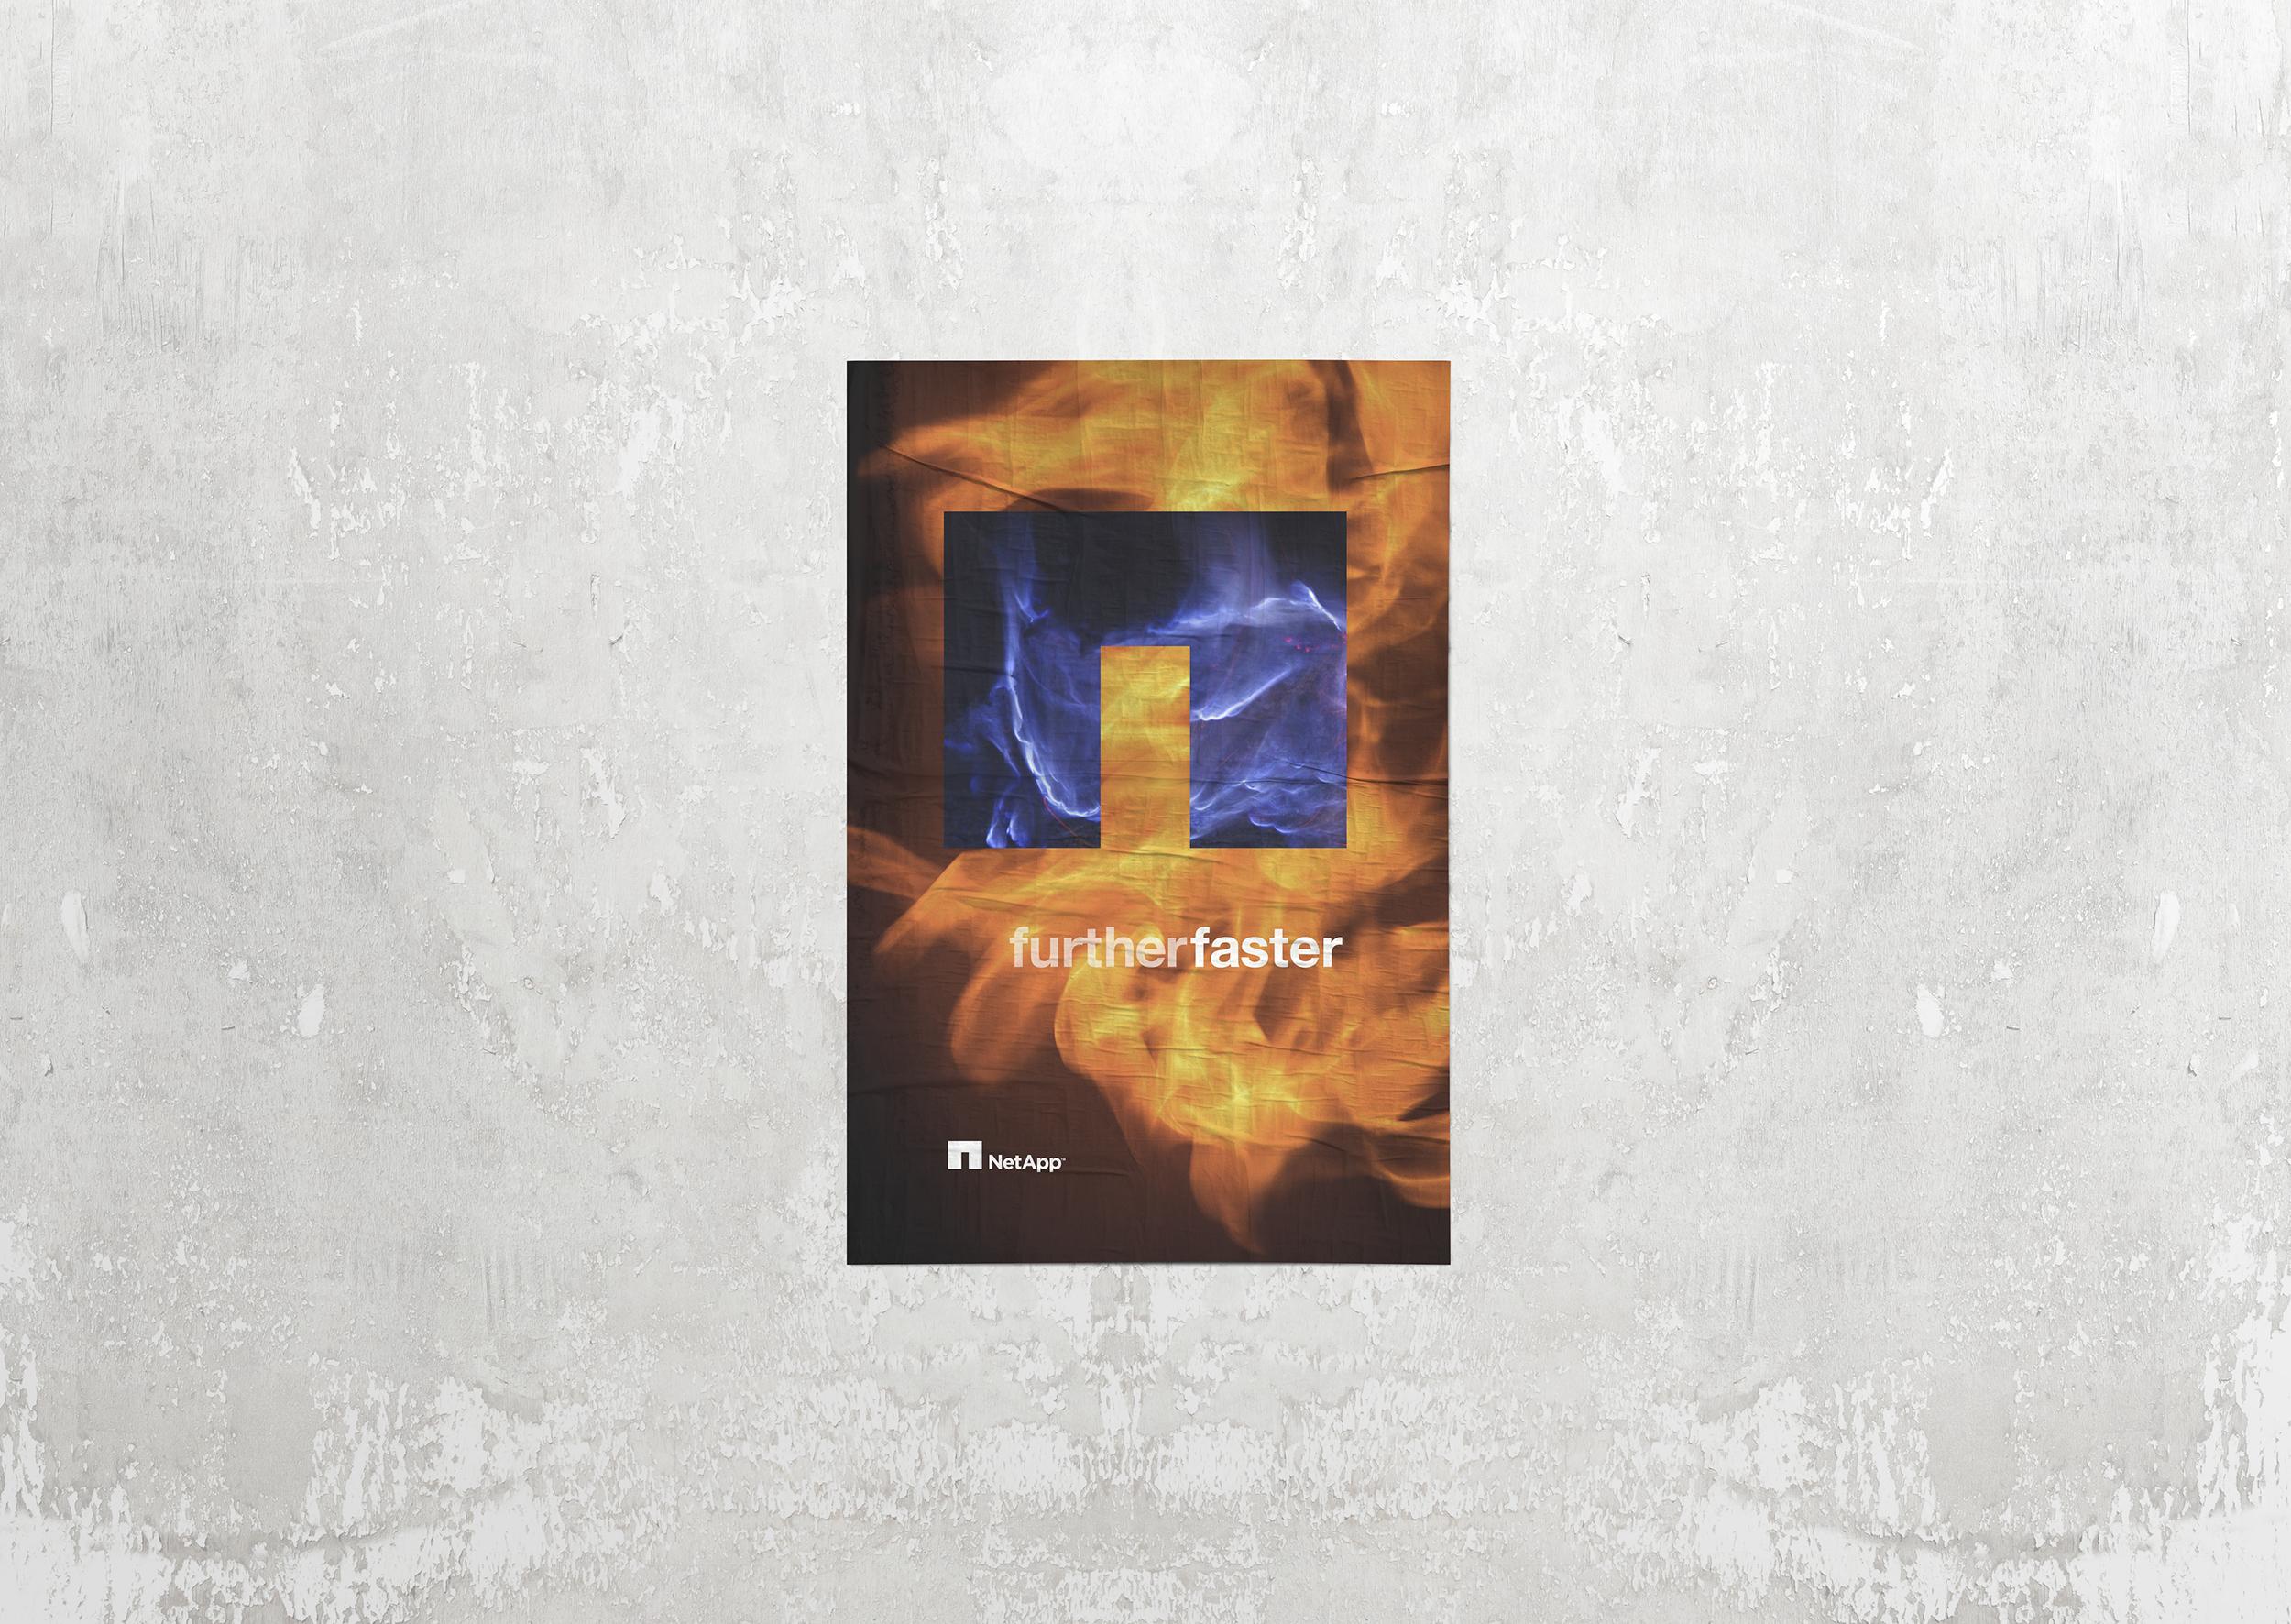 MorganSmail_NetApp-BrandCampaign_Fire.jpg